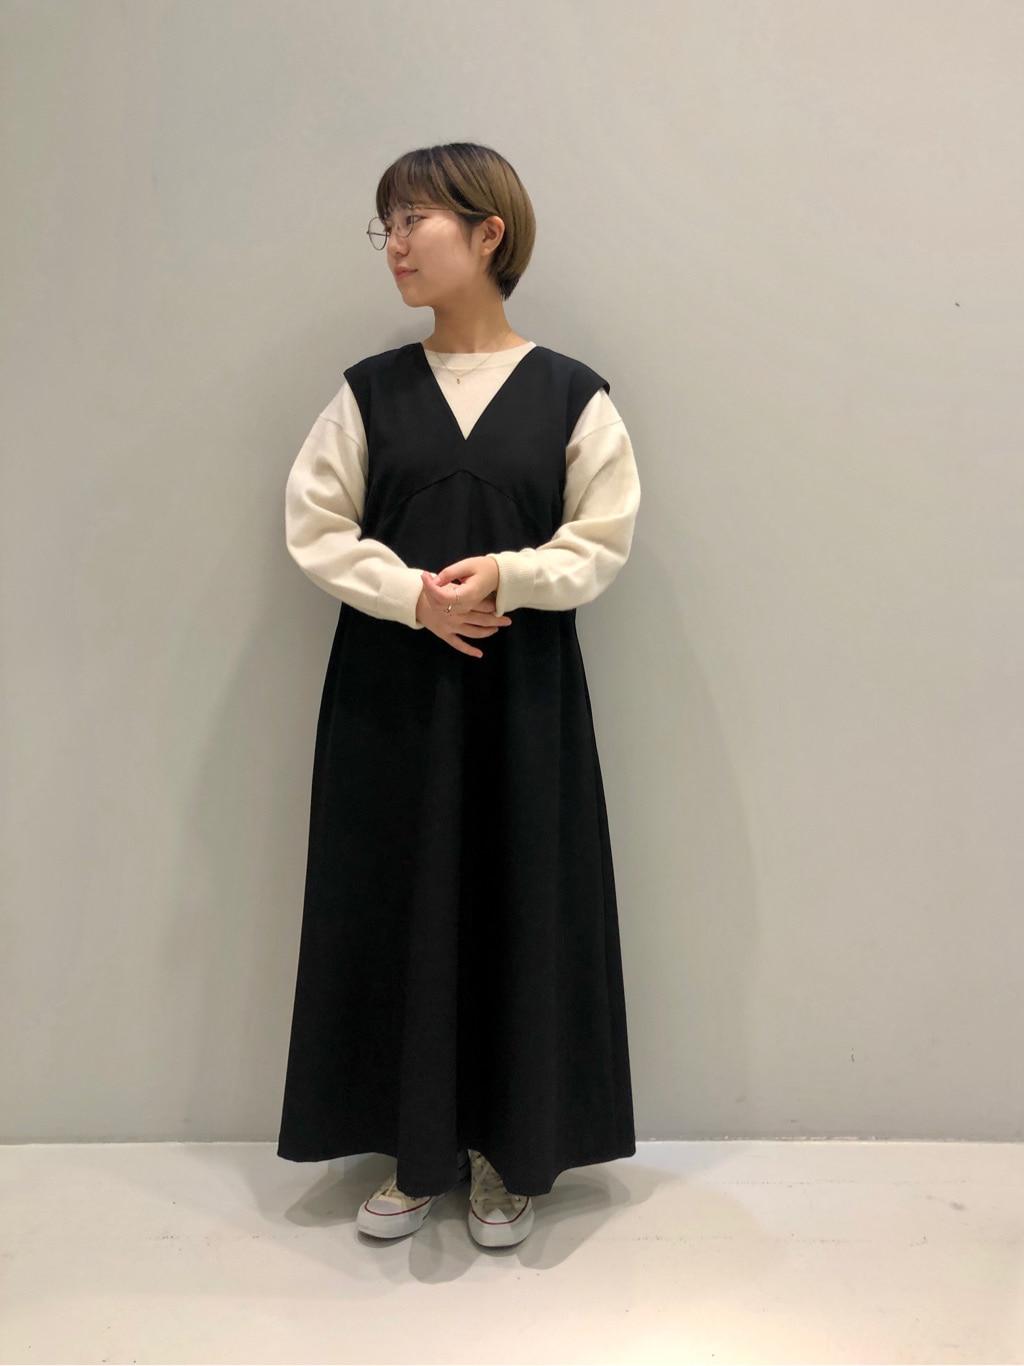 bulle de savon なんばシティ 身長:149cm 2020.11.10